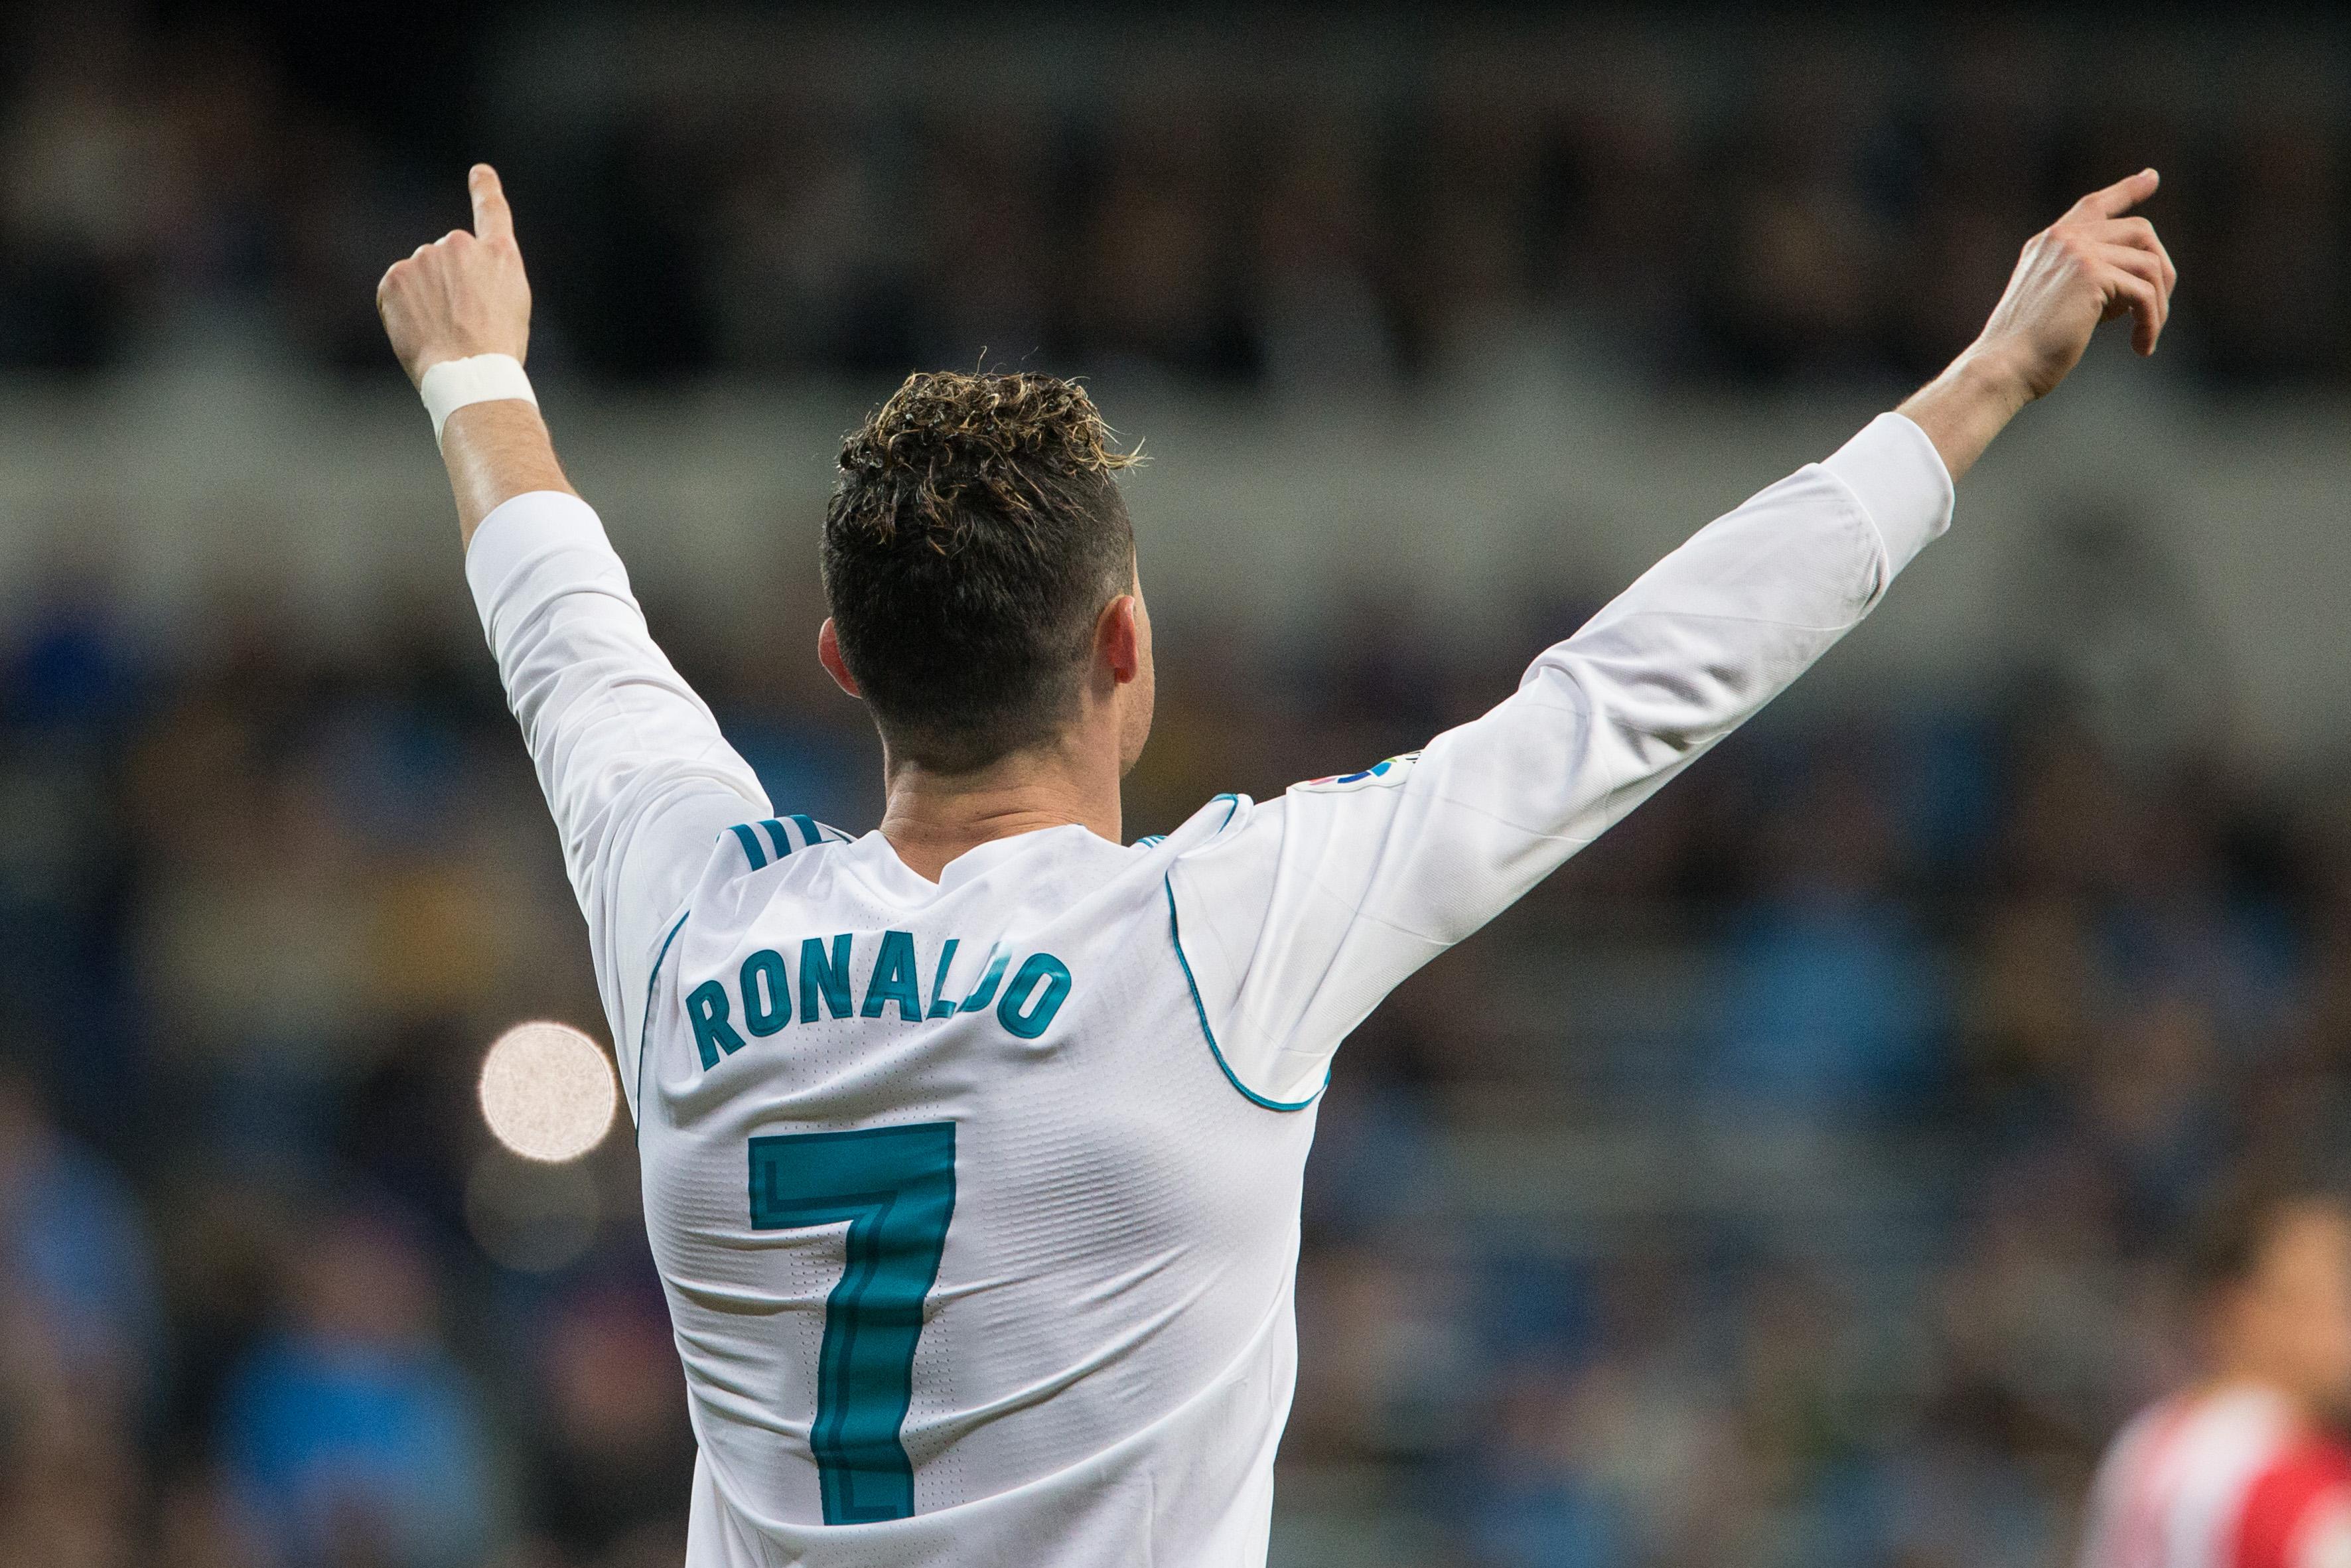 Football - Etranger - Cristiano Ronaldo: Le retour du roi